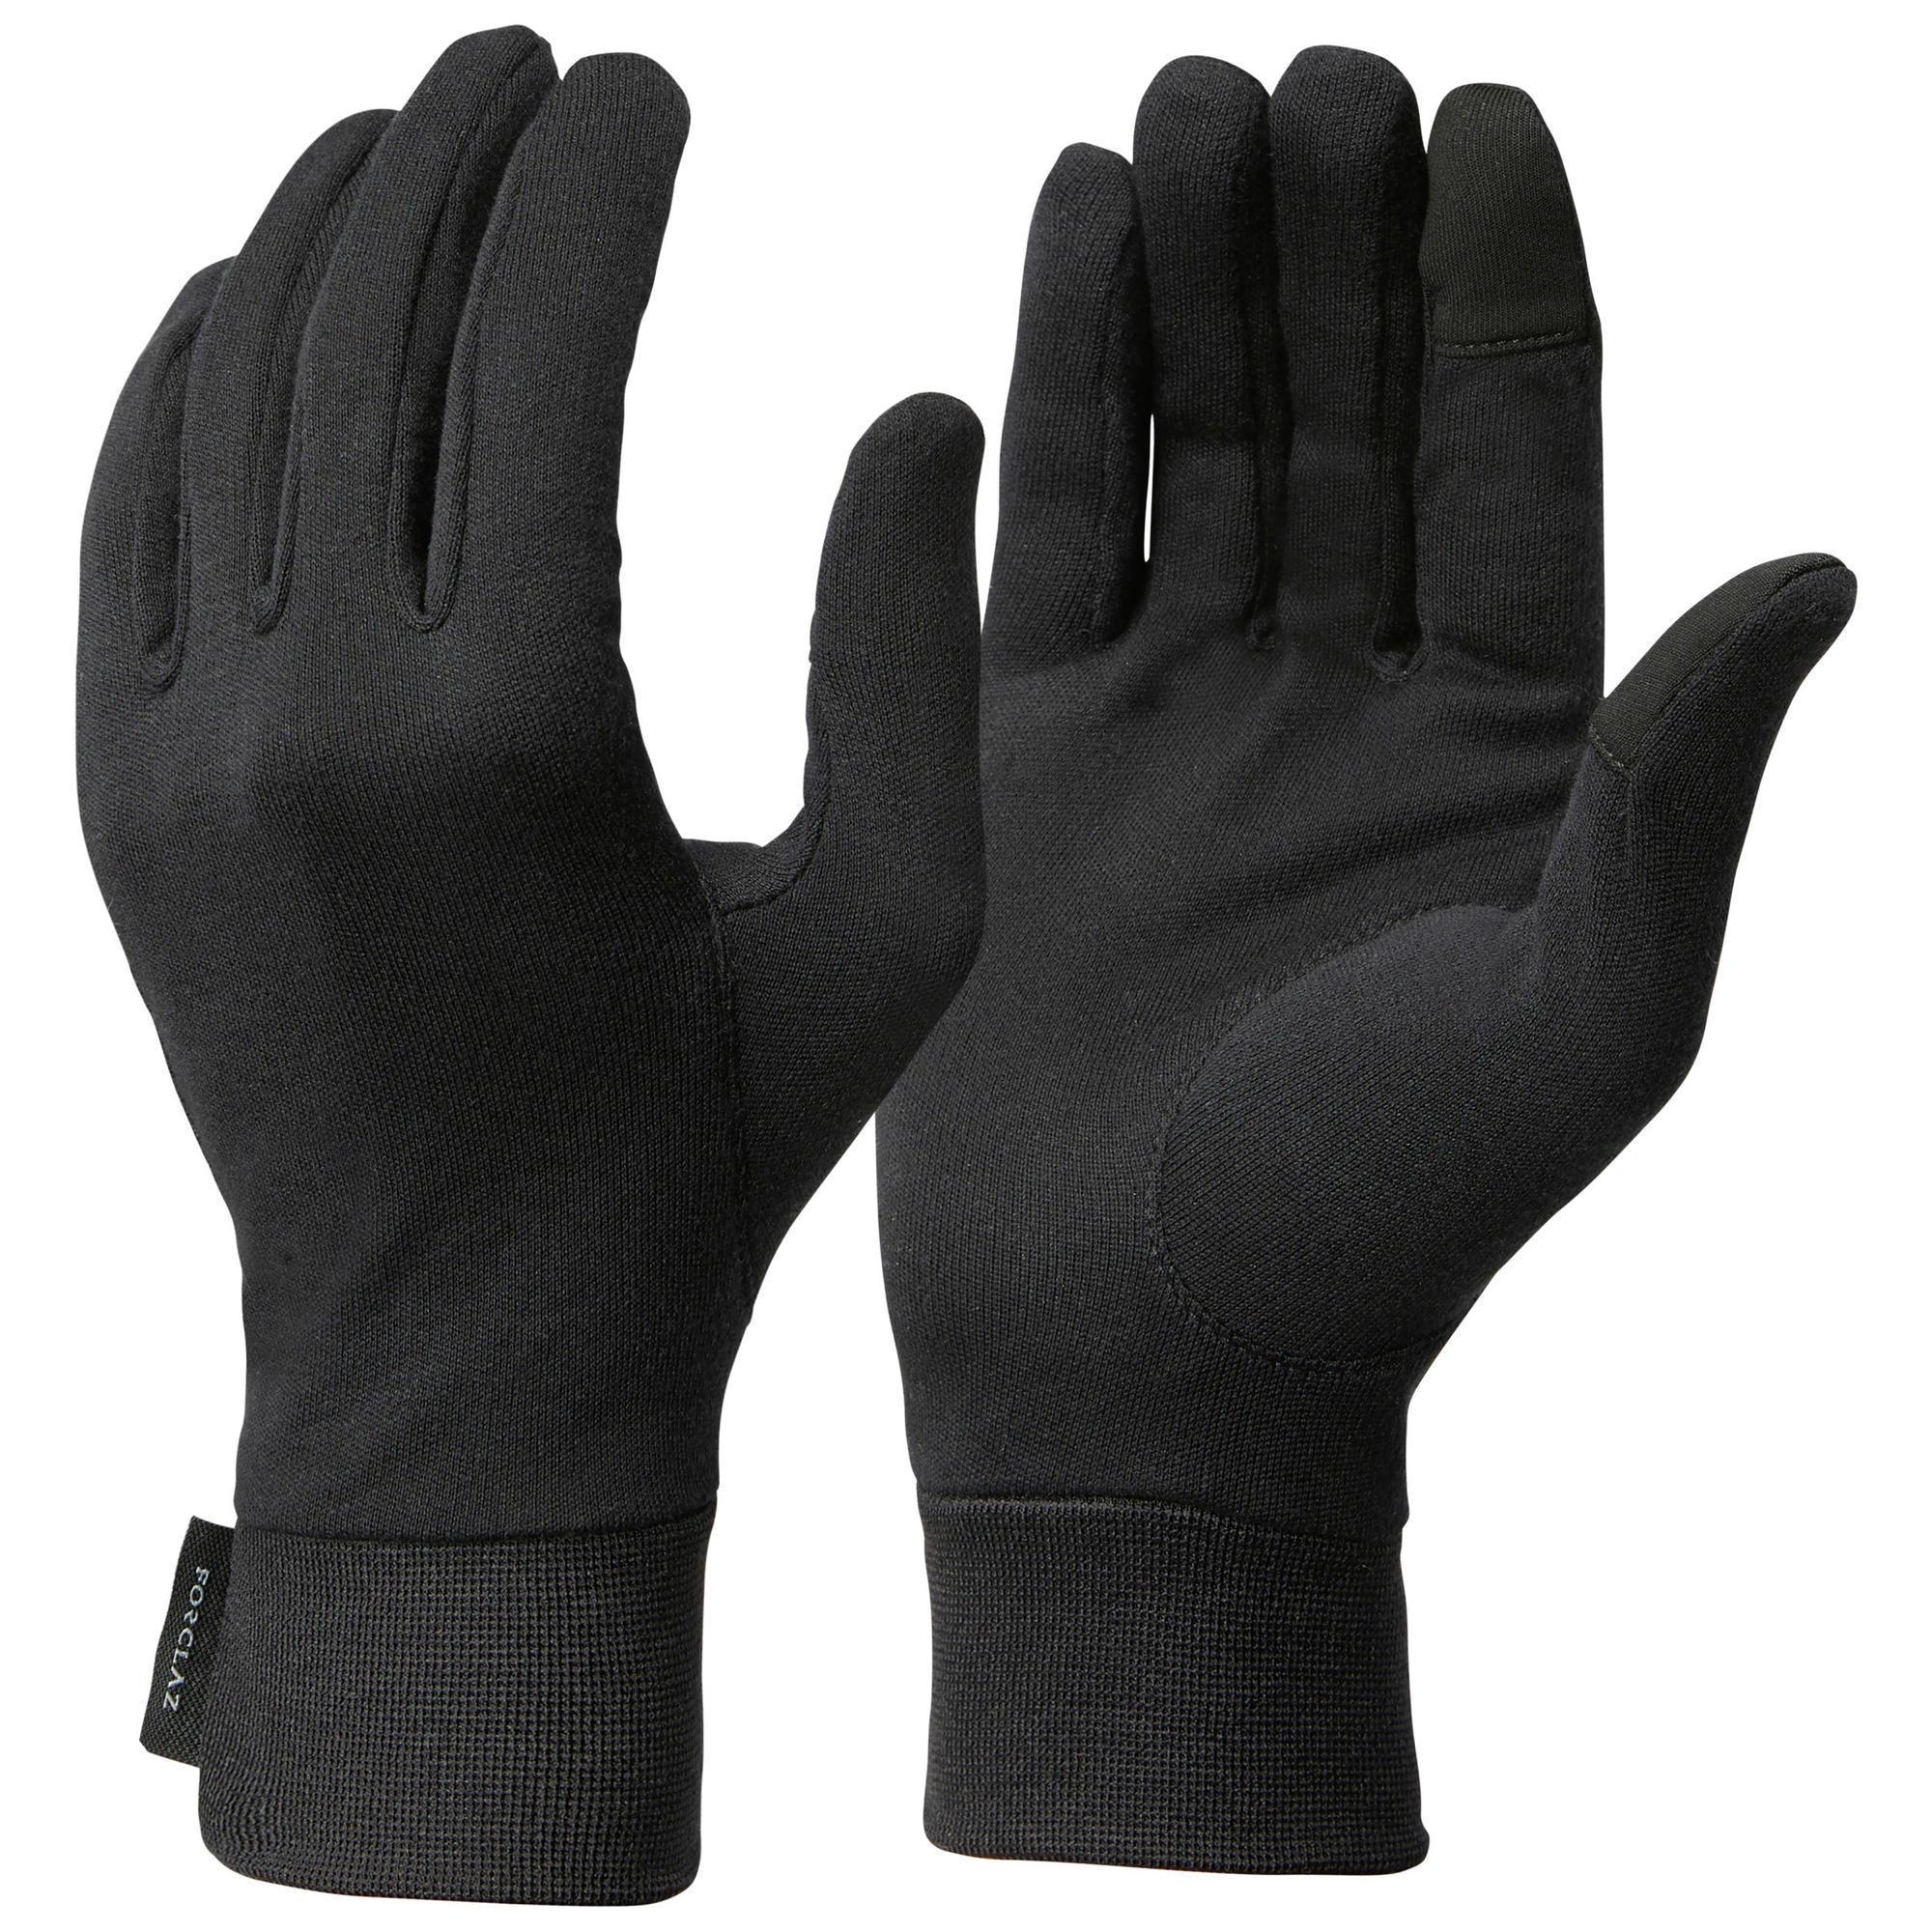 Unterziehhandschuhe Bergtrekking Trek 500 100% Seide Erwachsene | Accessoires > Handschuhe > Sonstige Handschuhe | Forclaz